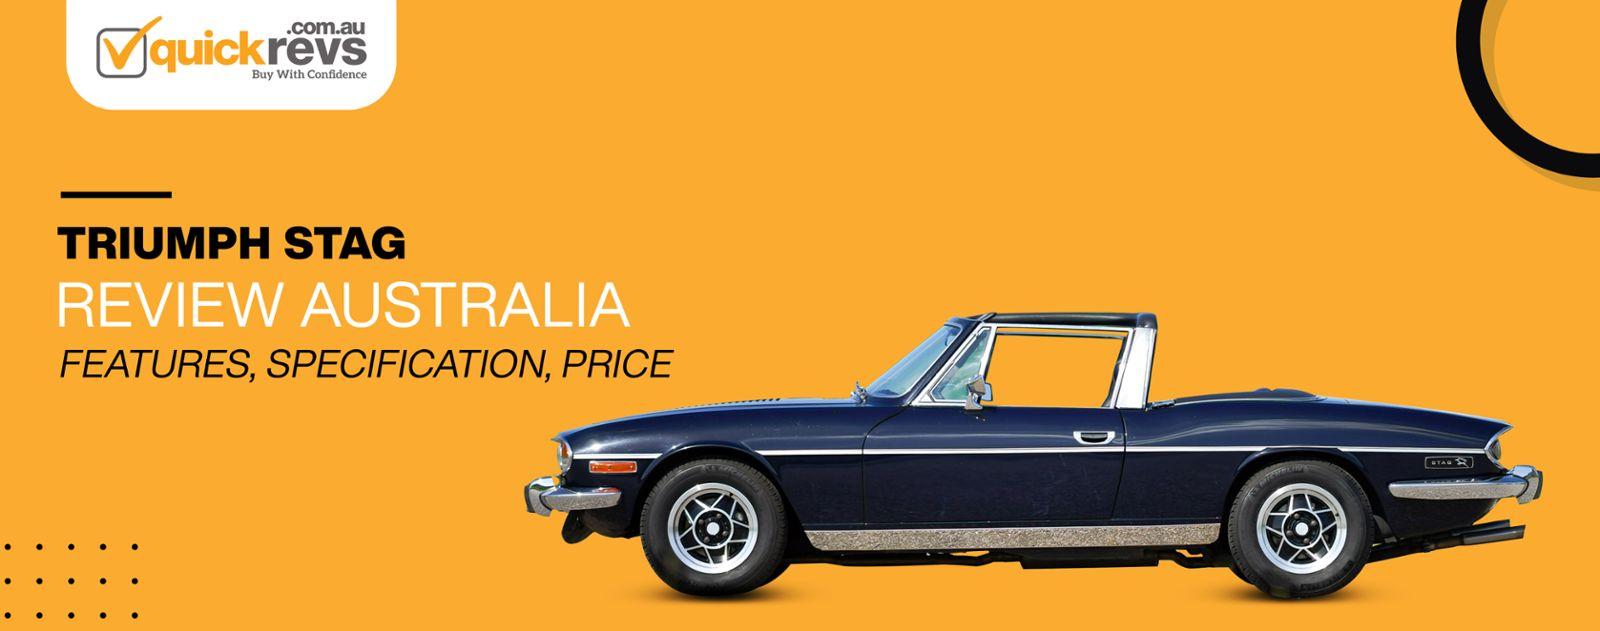 Triumph Stag Review Australia